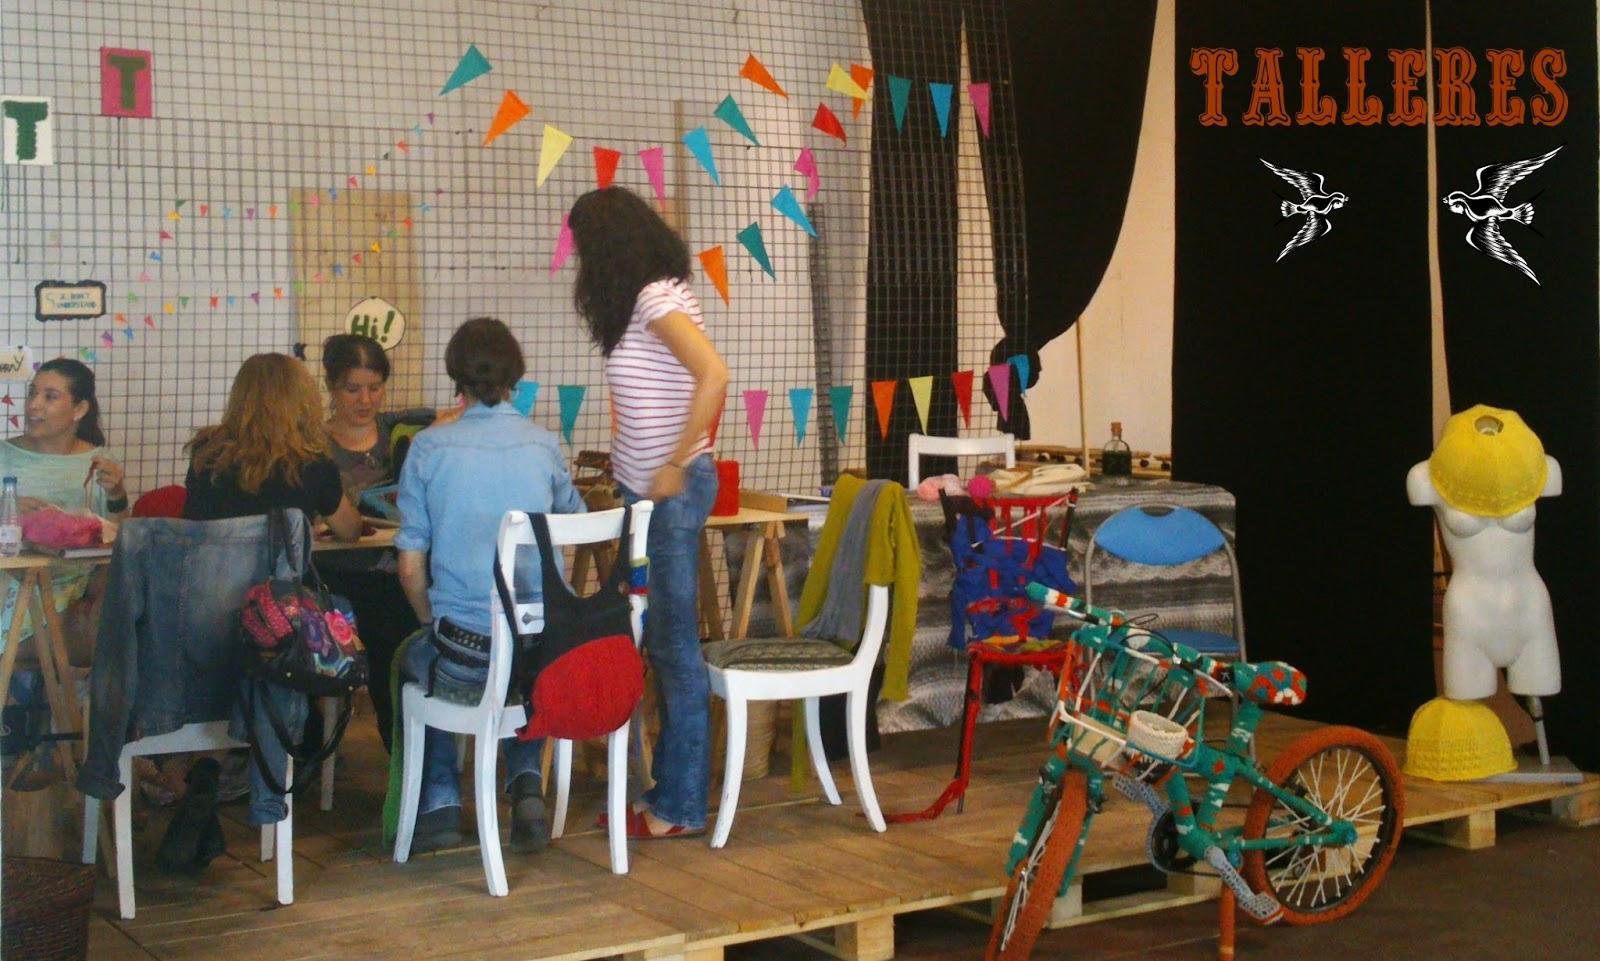 talleres artesanía